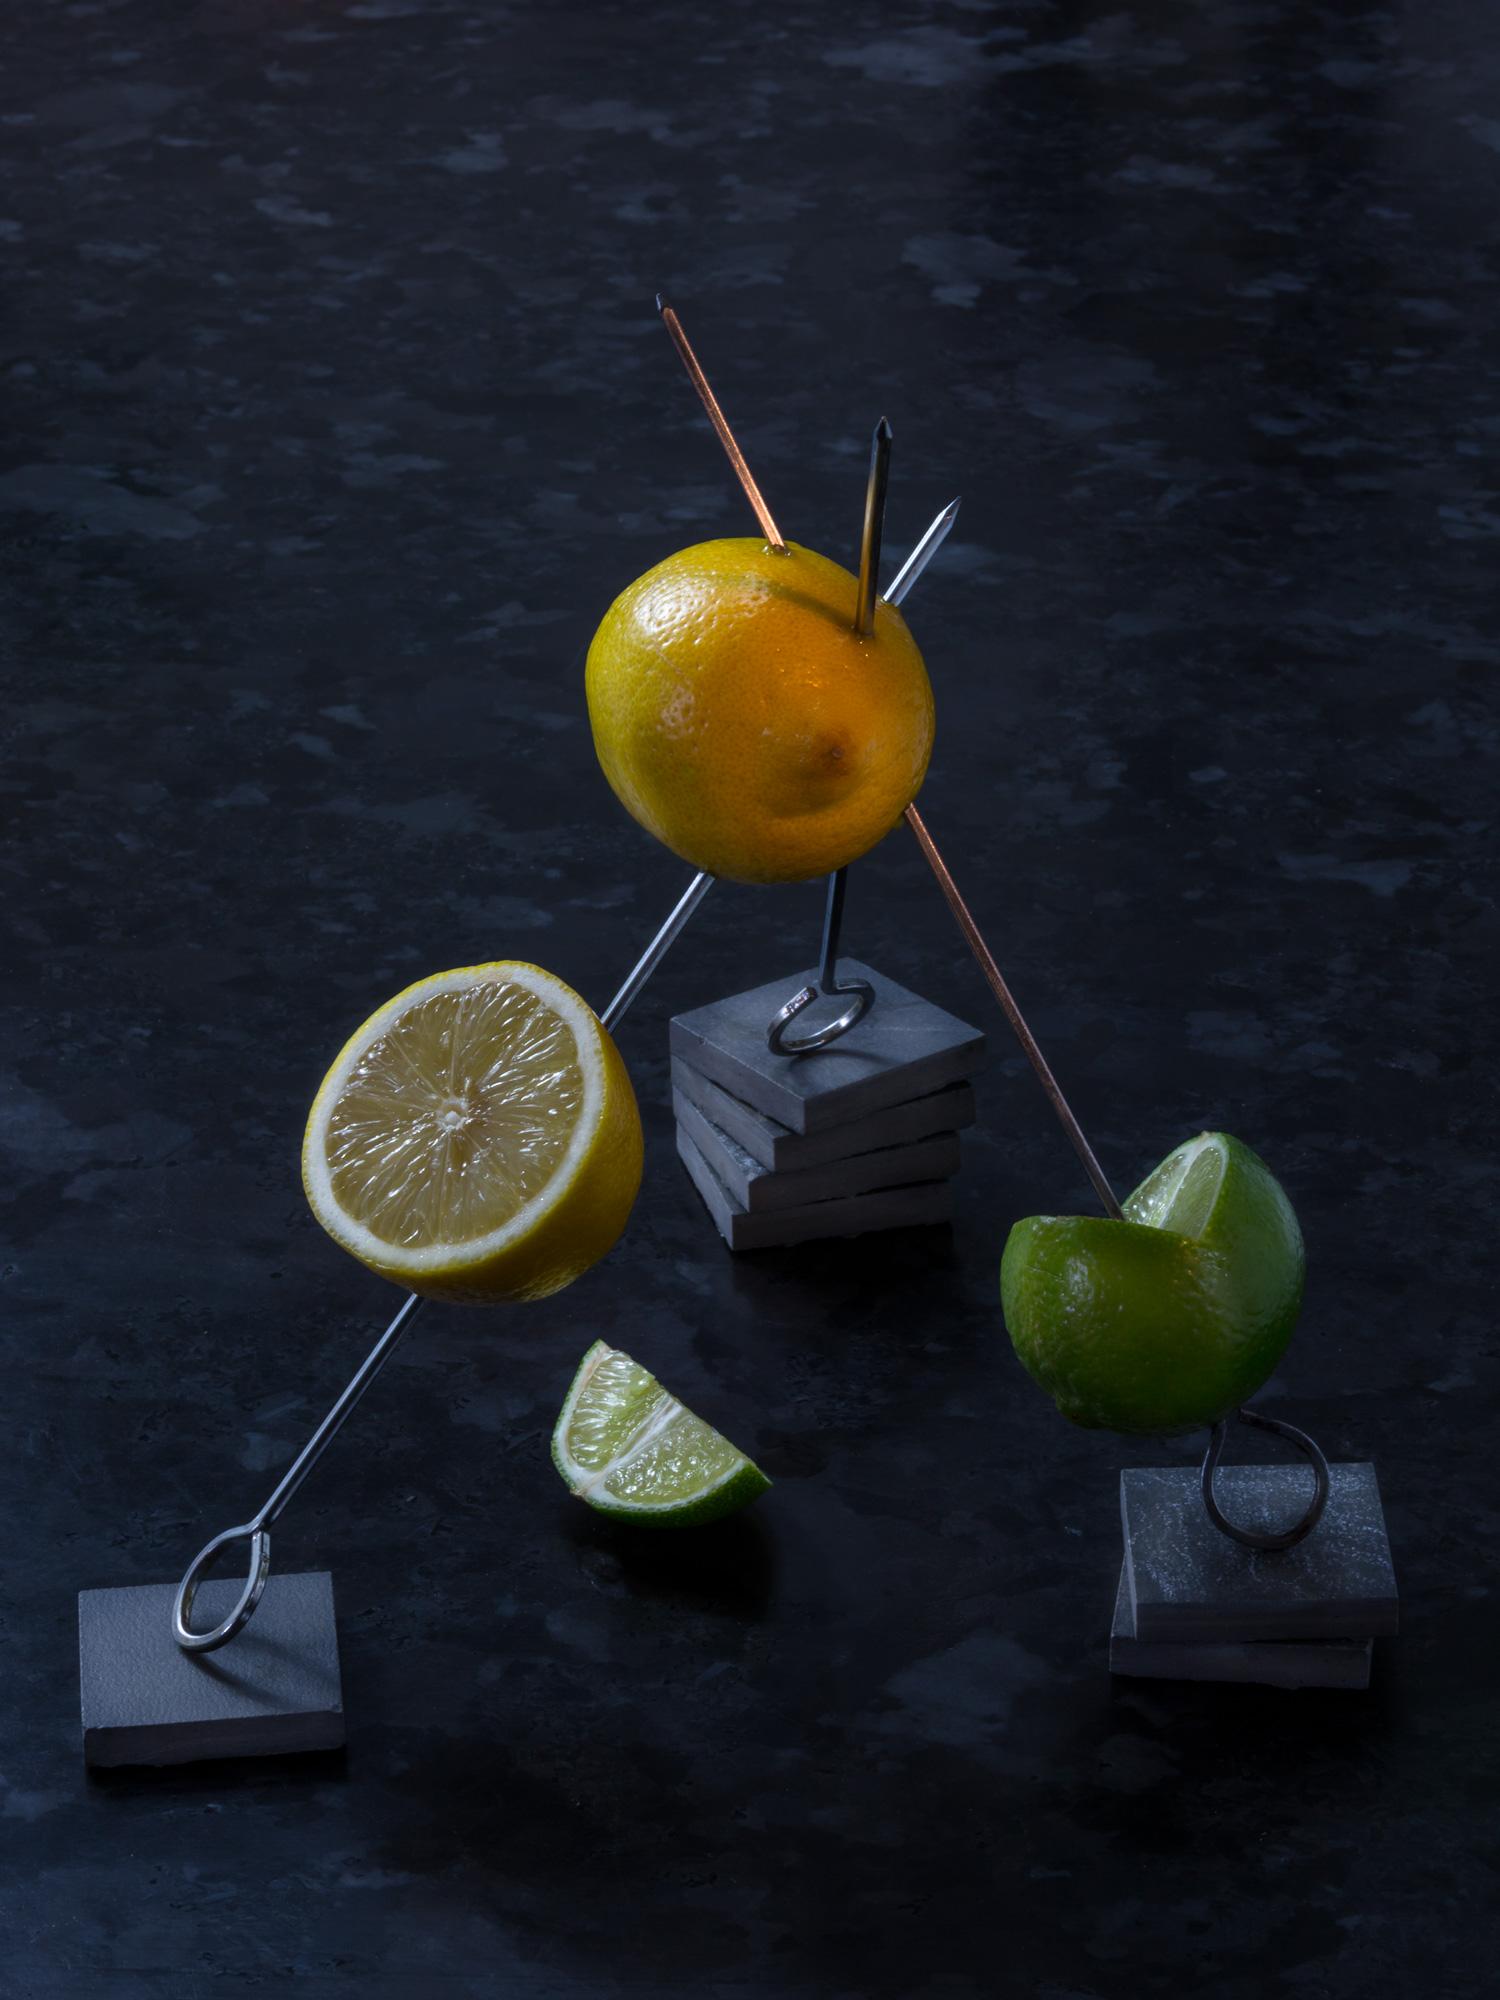 DanDorio_FruitKabob_LemonLime.jpg